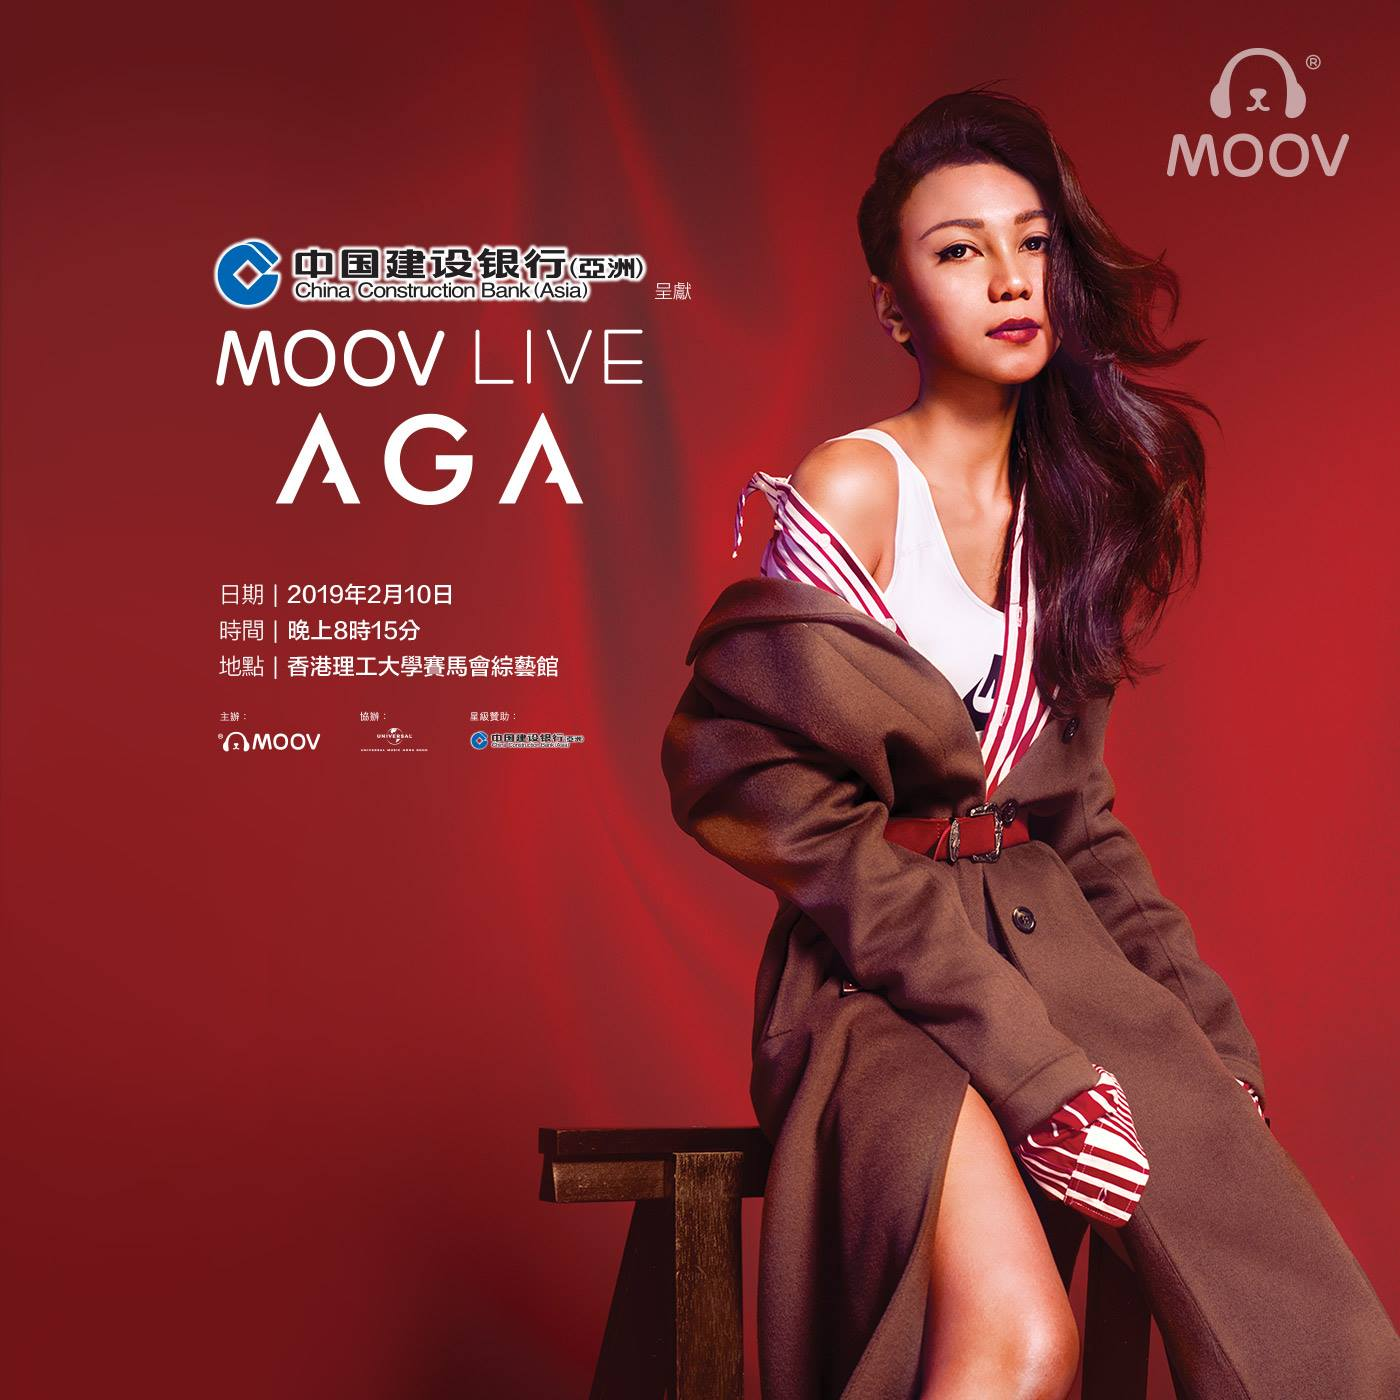 MOOV LIVE AGA.jpg